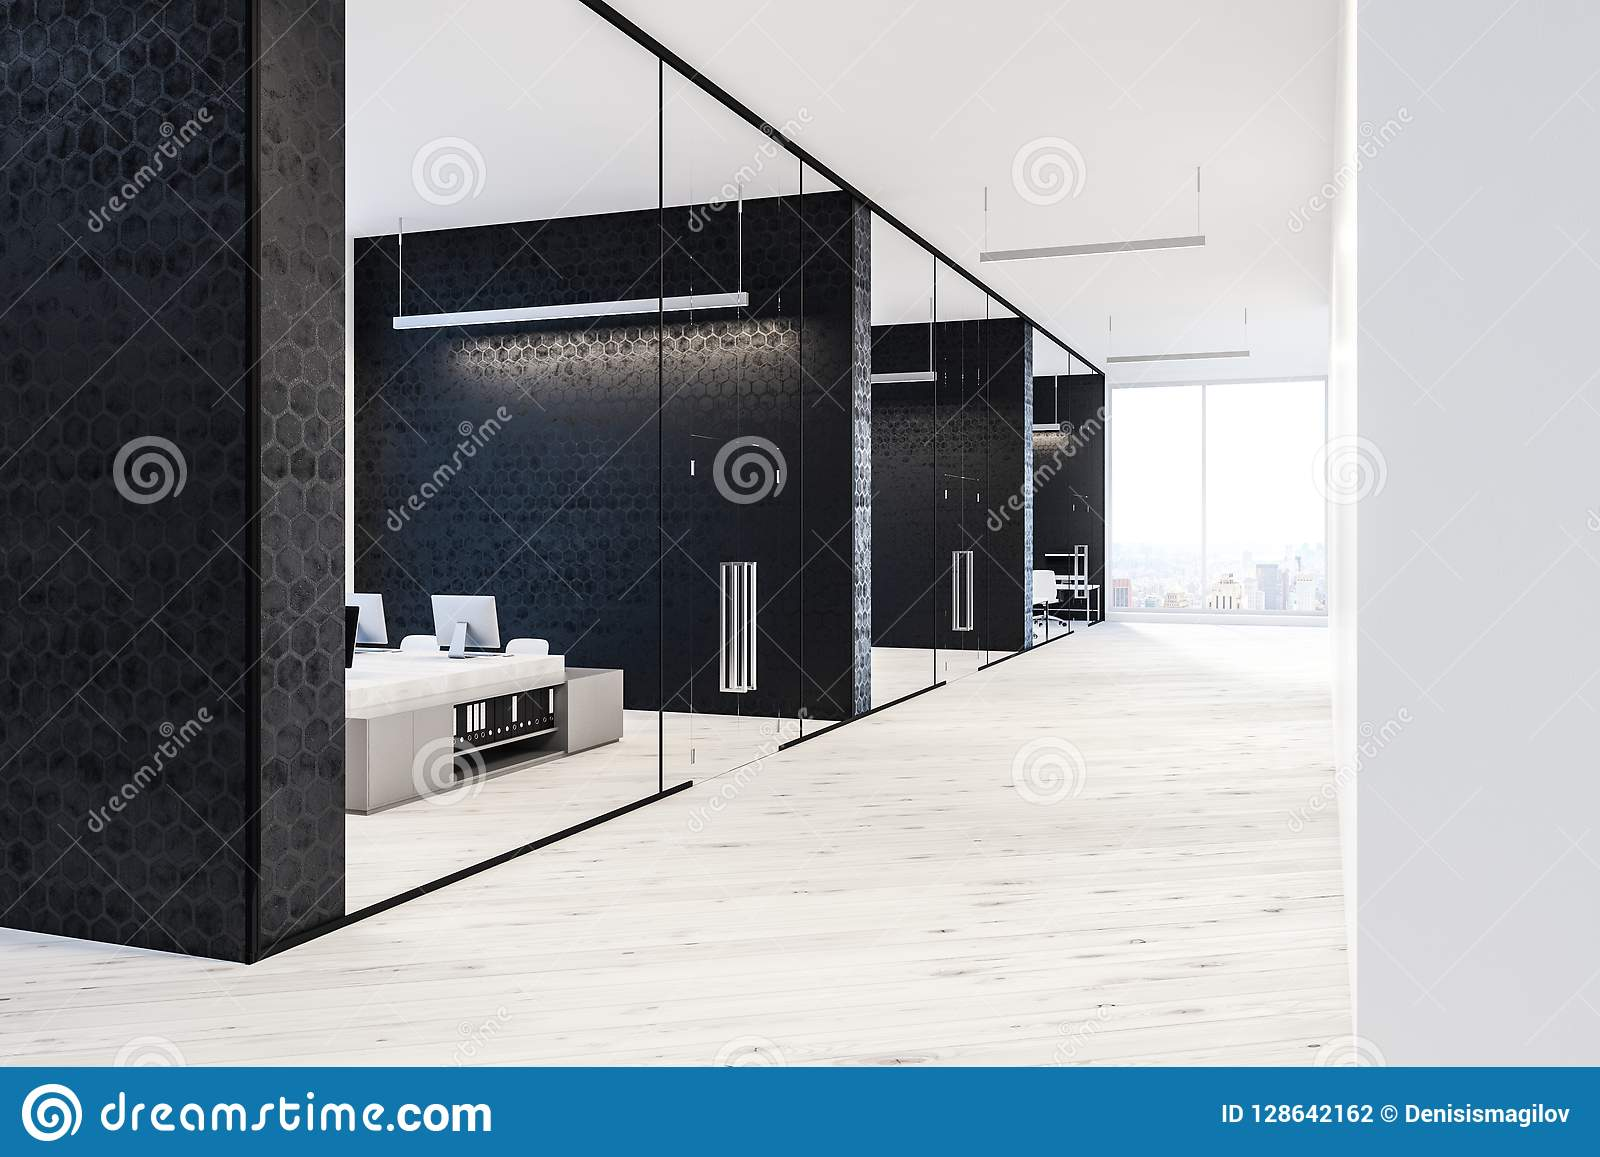 Black And White Office Lobby Interior Stock Illustration ...